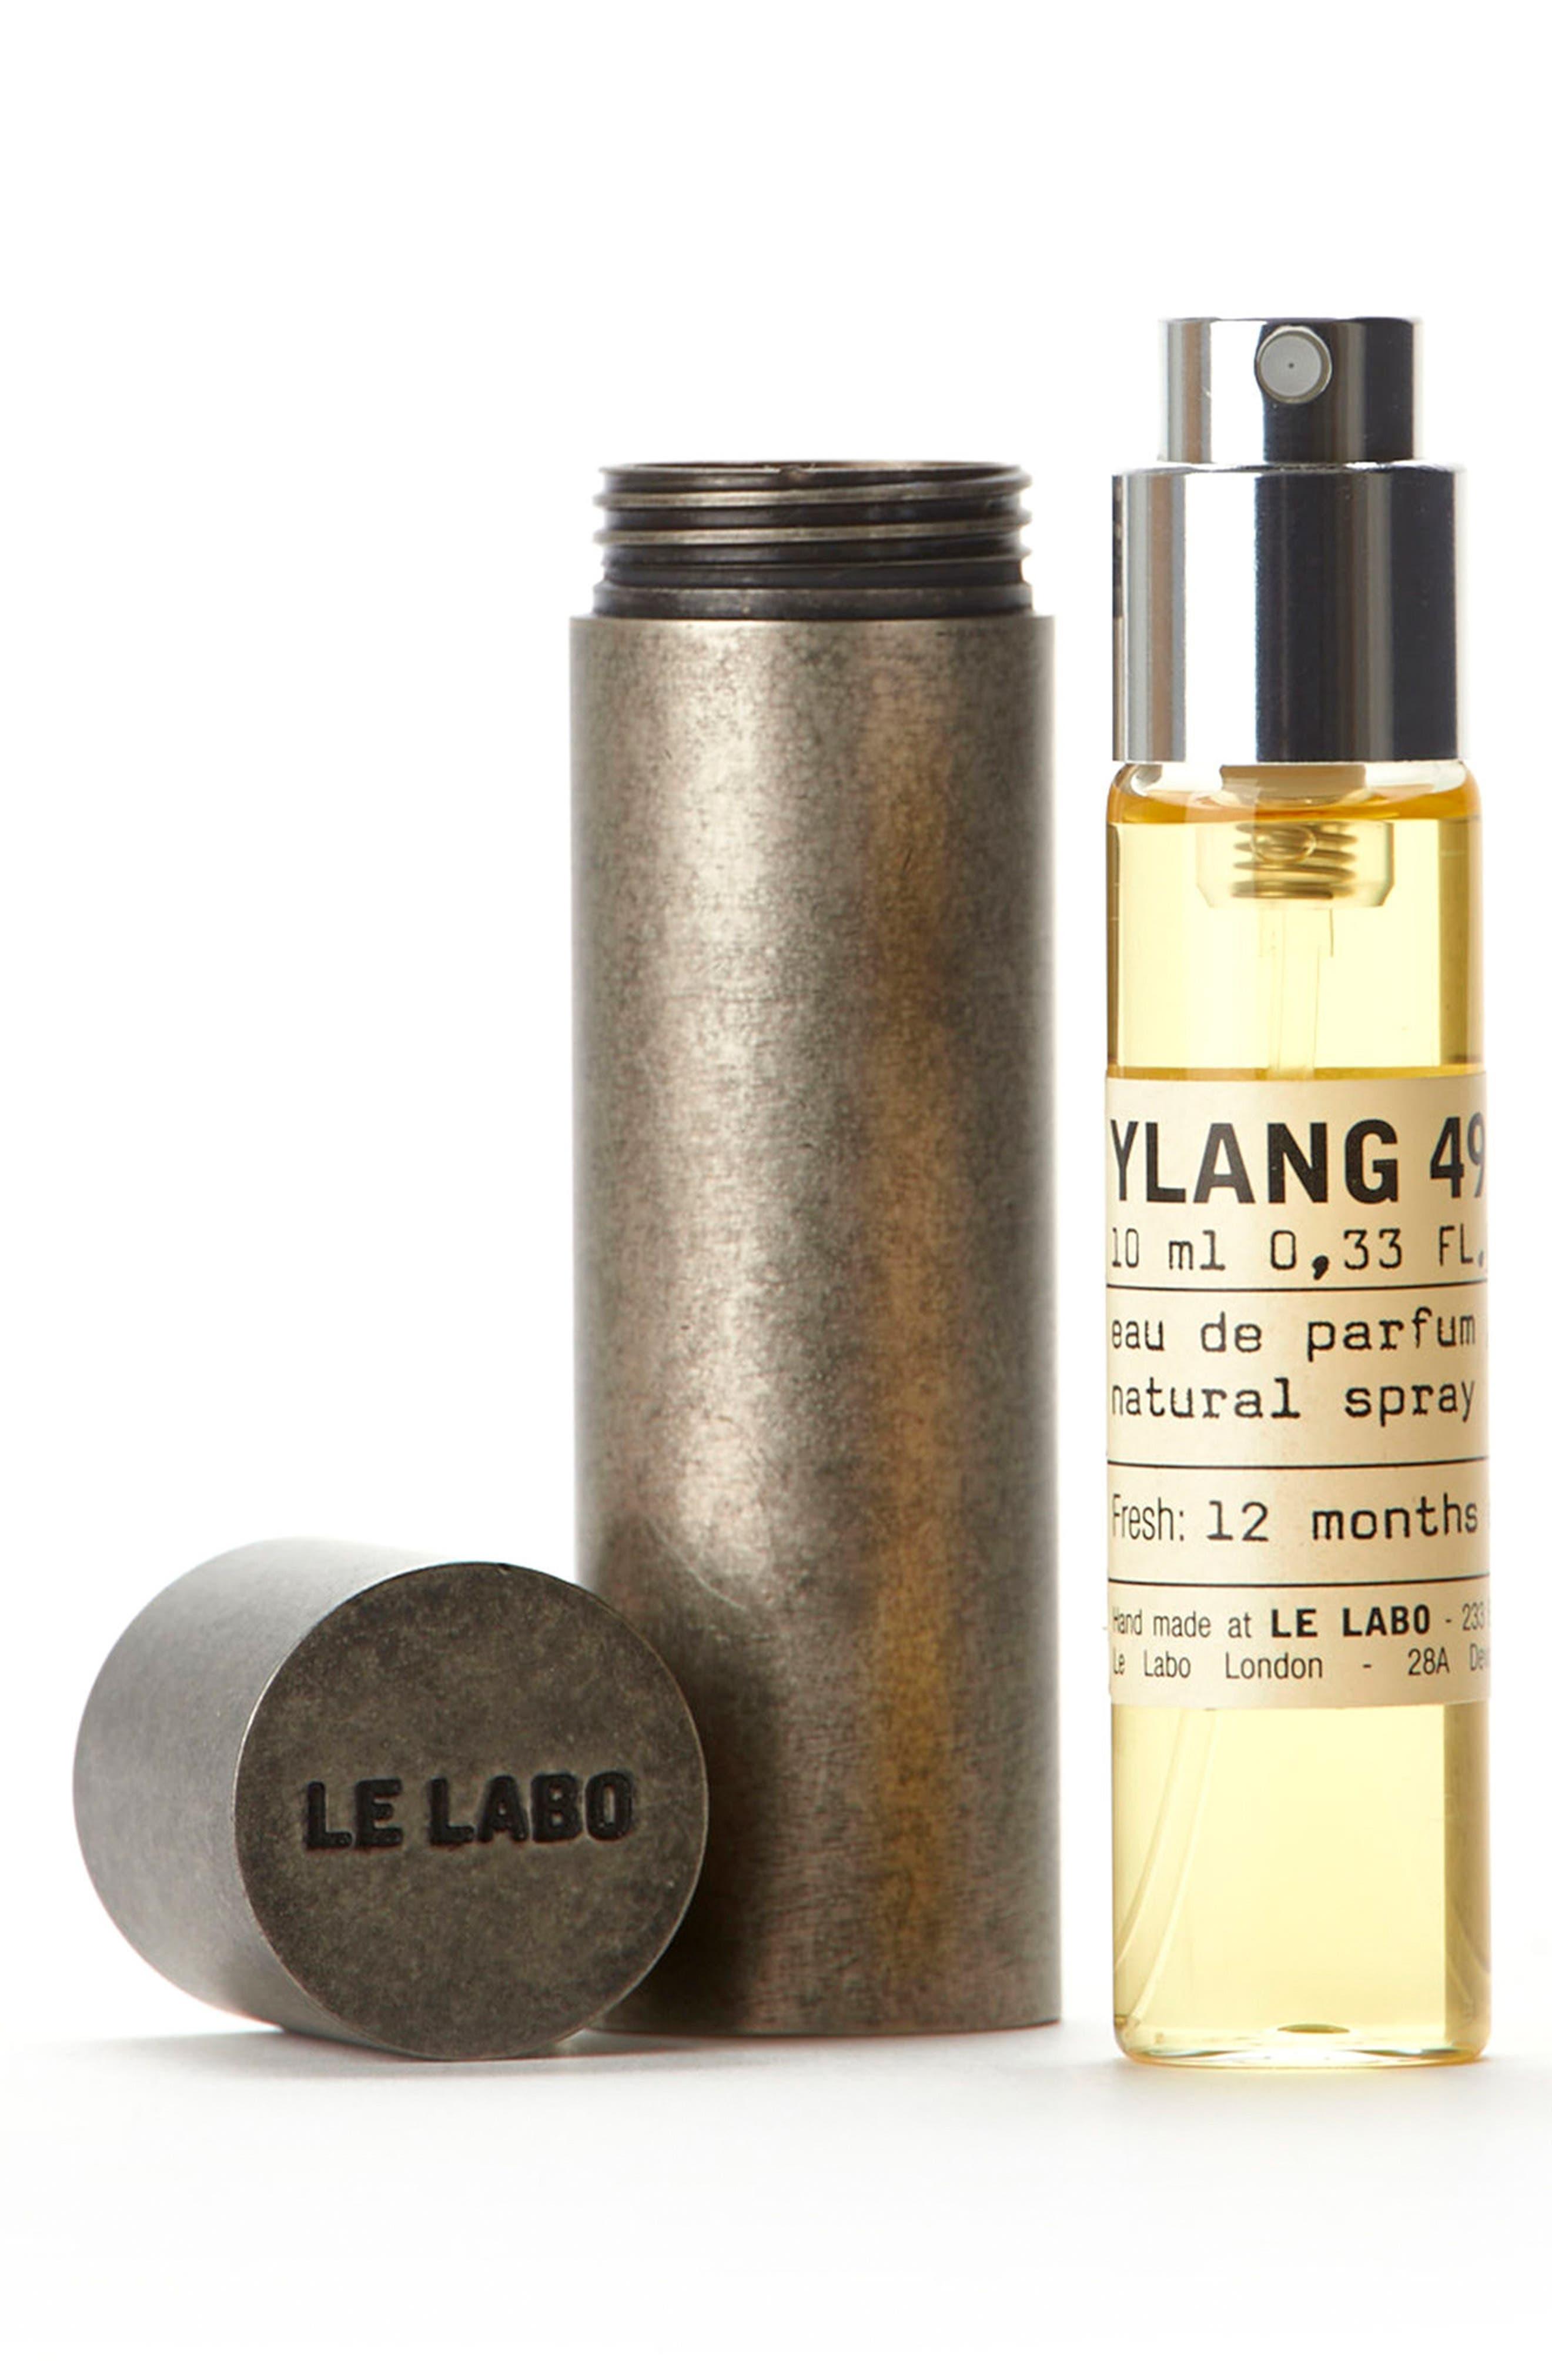 Alternate Image 1 Selected - Le Labo 'Ylang 49' Travel Tube